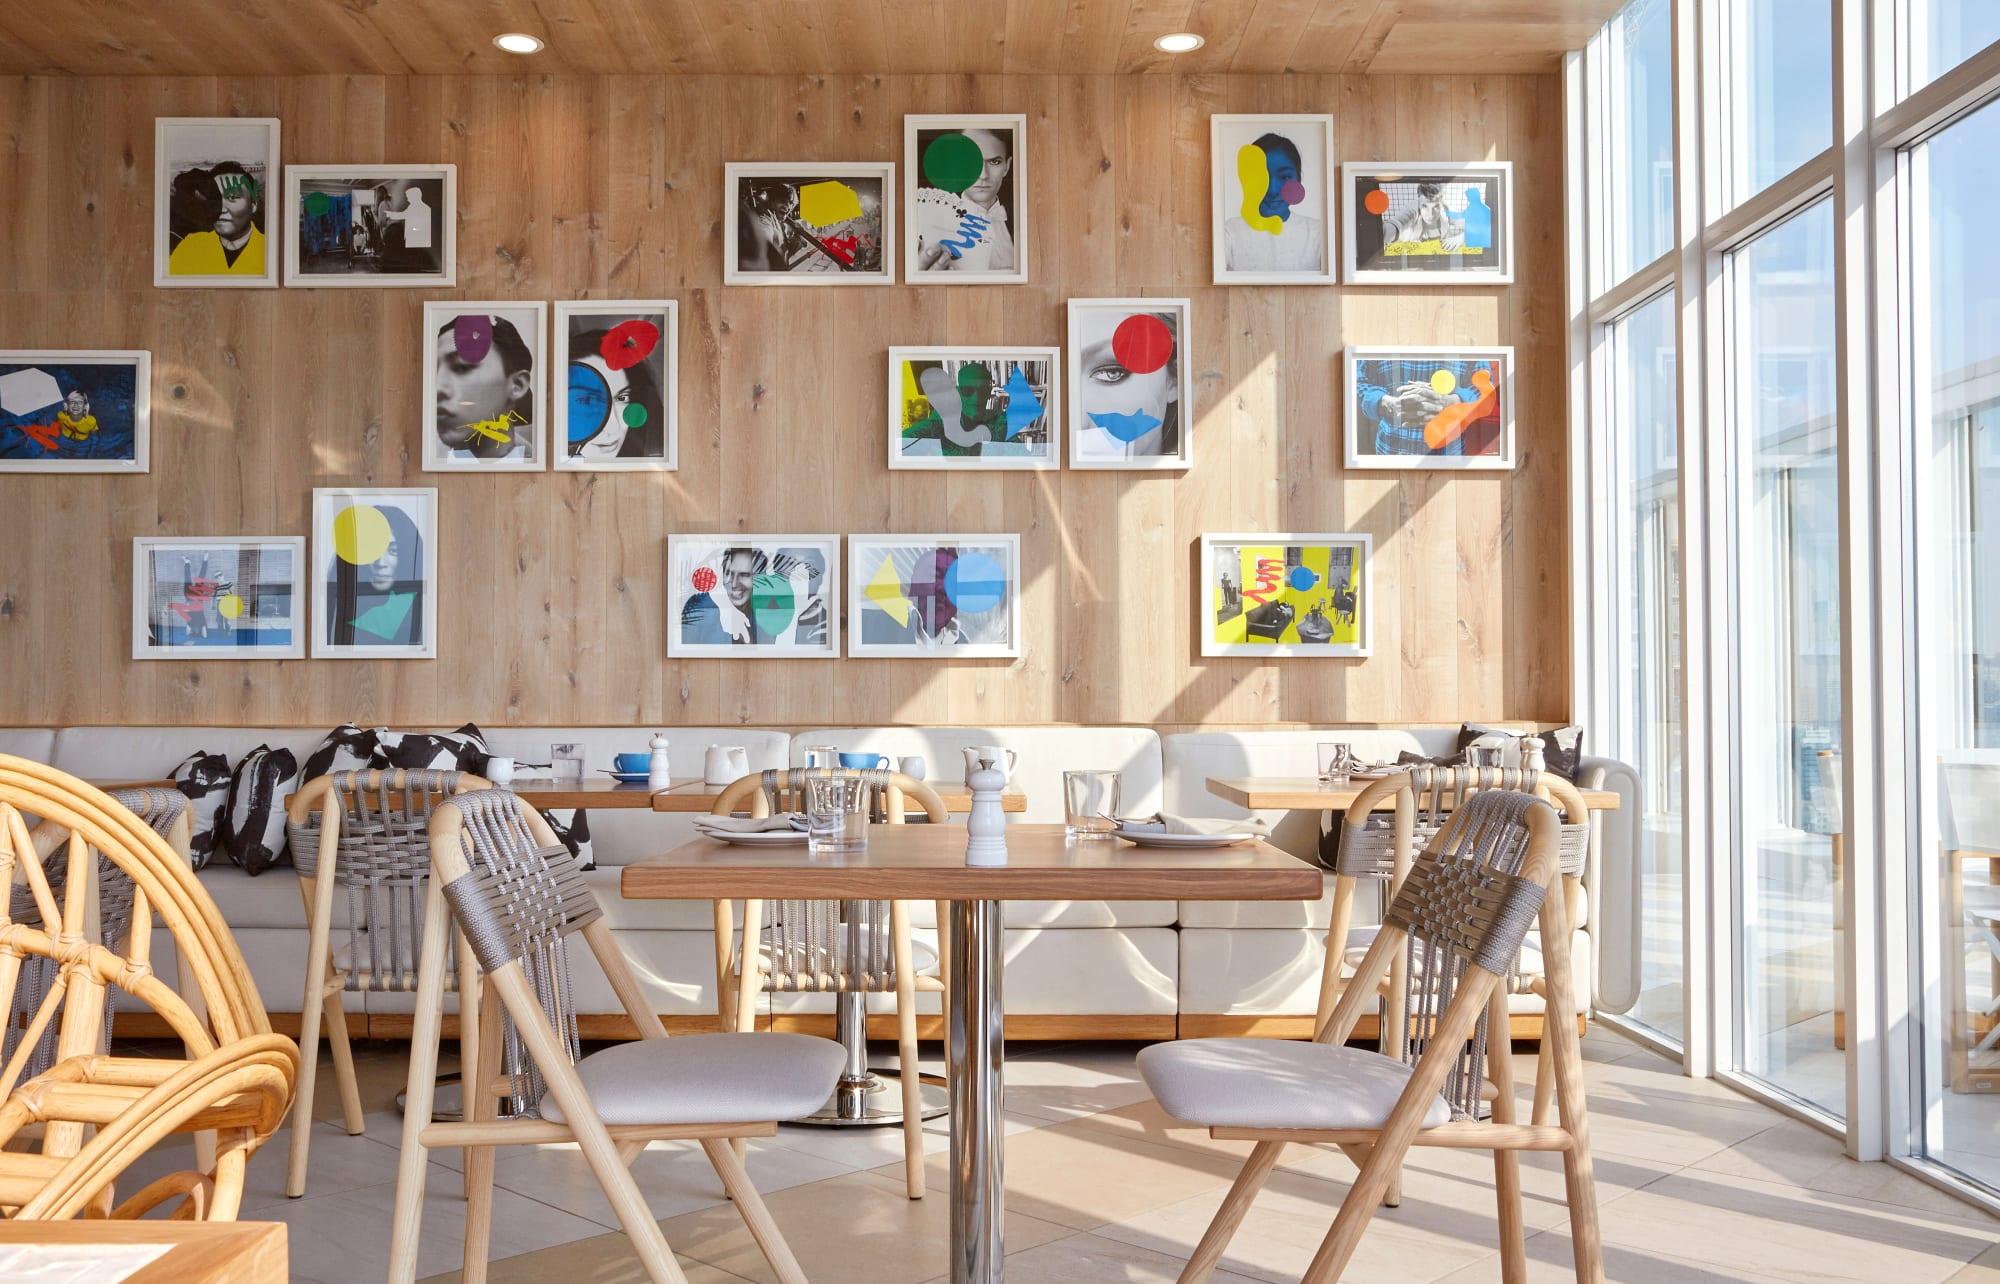 Interior Design by Studio Munge at Kost, Toronto - Interior Design